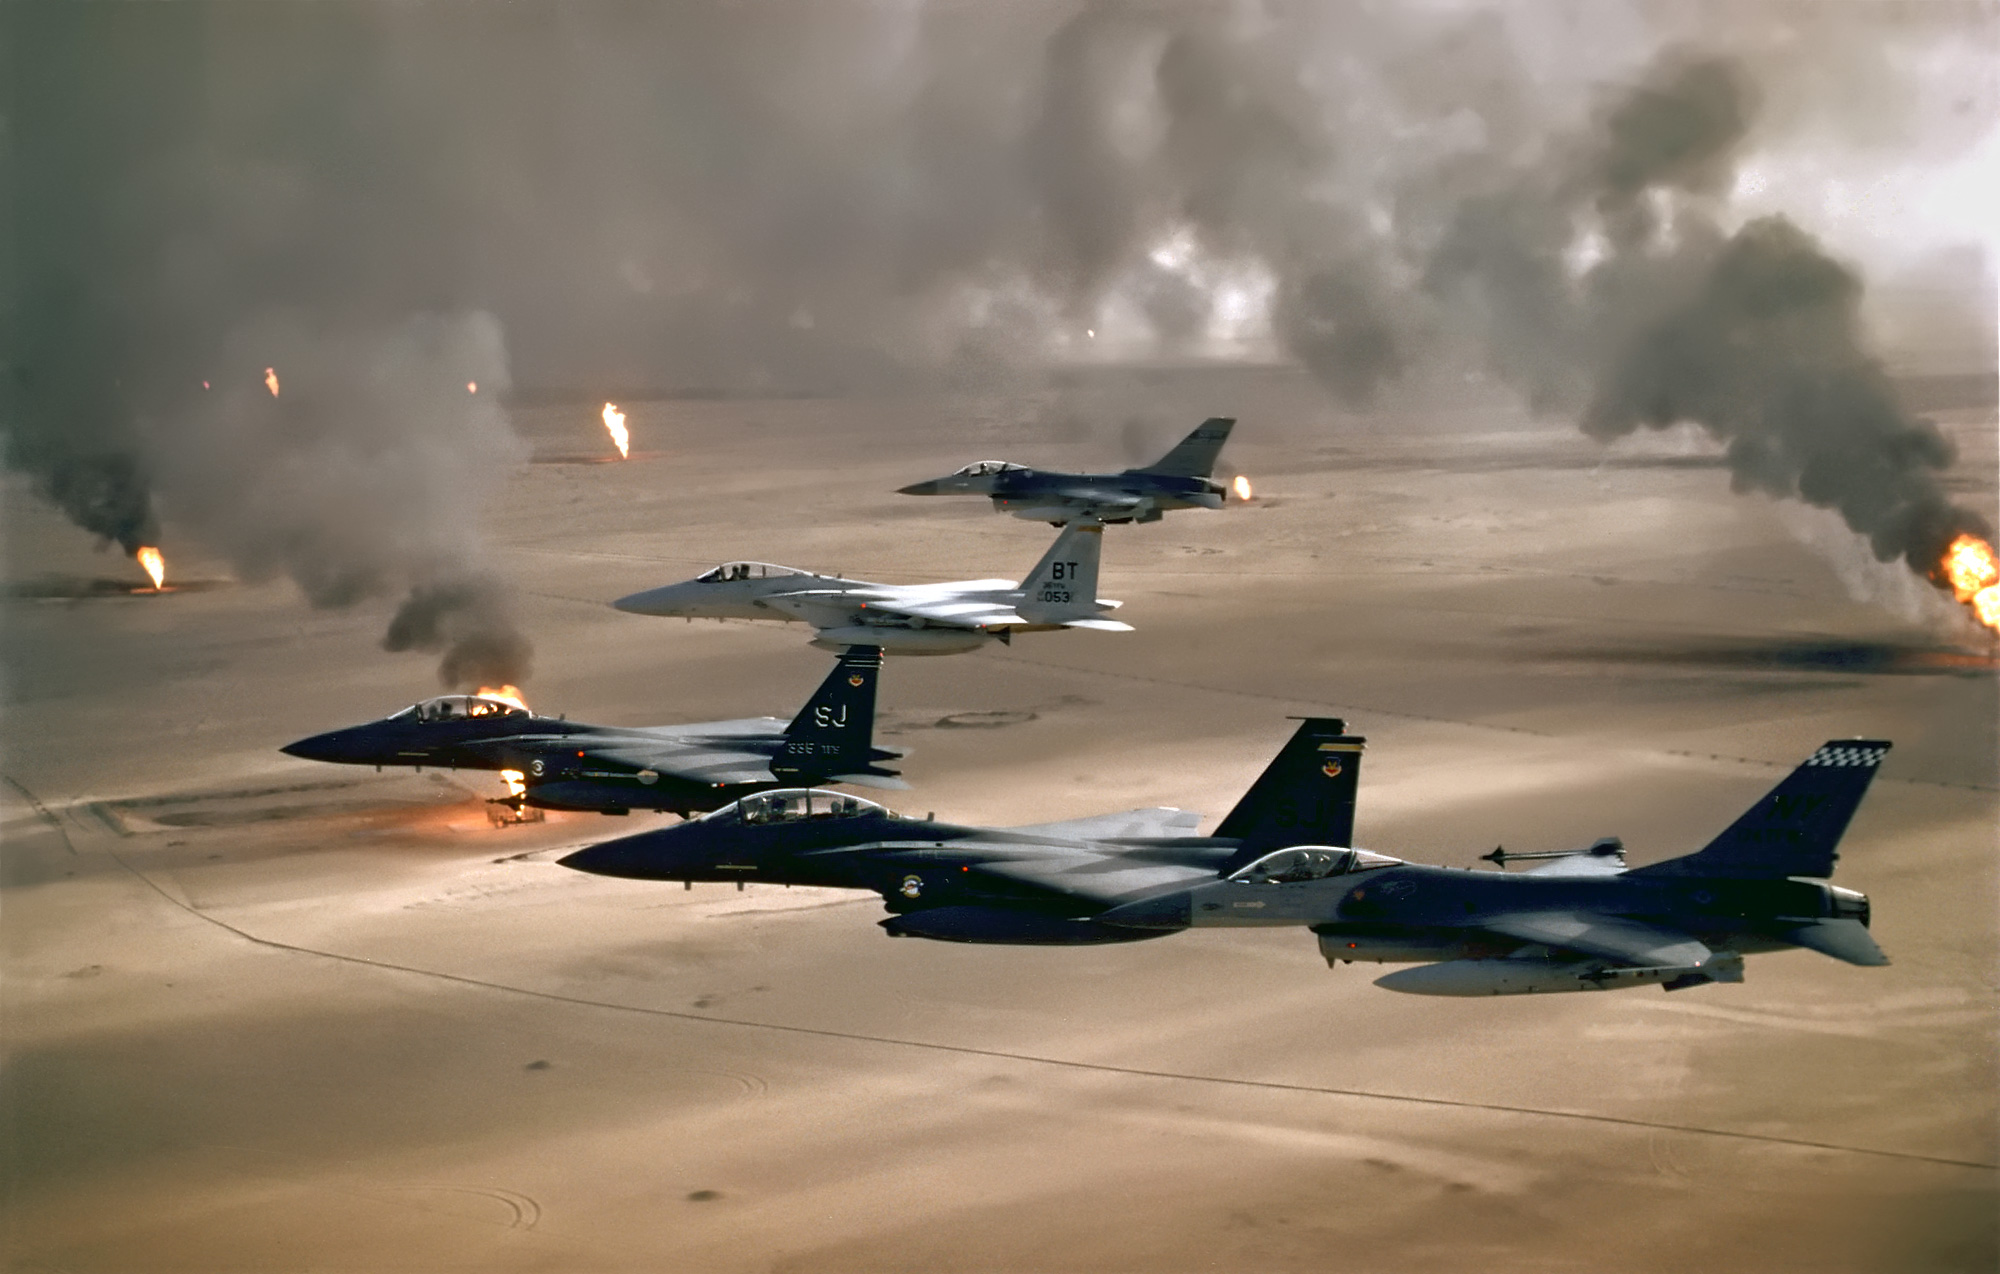 VA Extends Deadline For Medically Unexplainable Gulf War Illness Benefits Until 2021 Featured